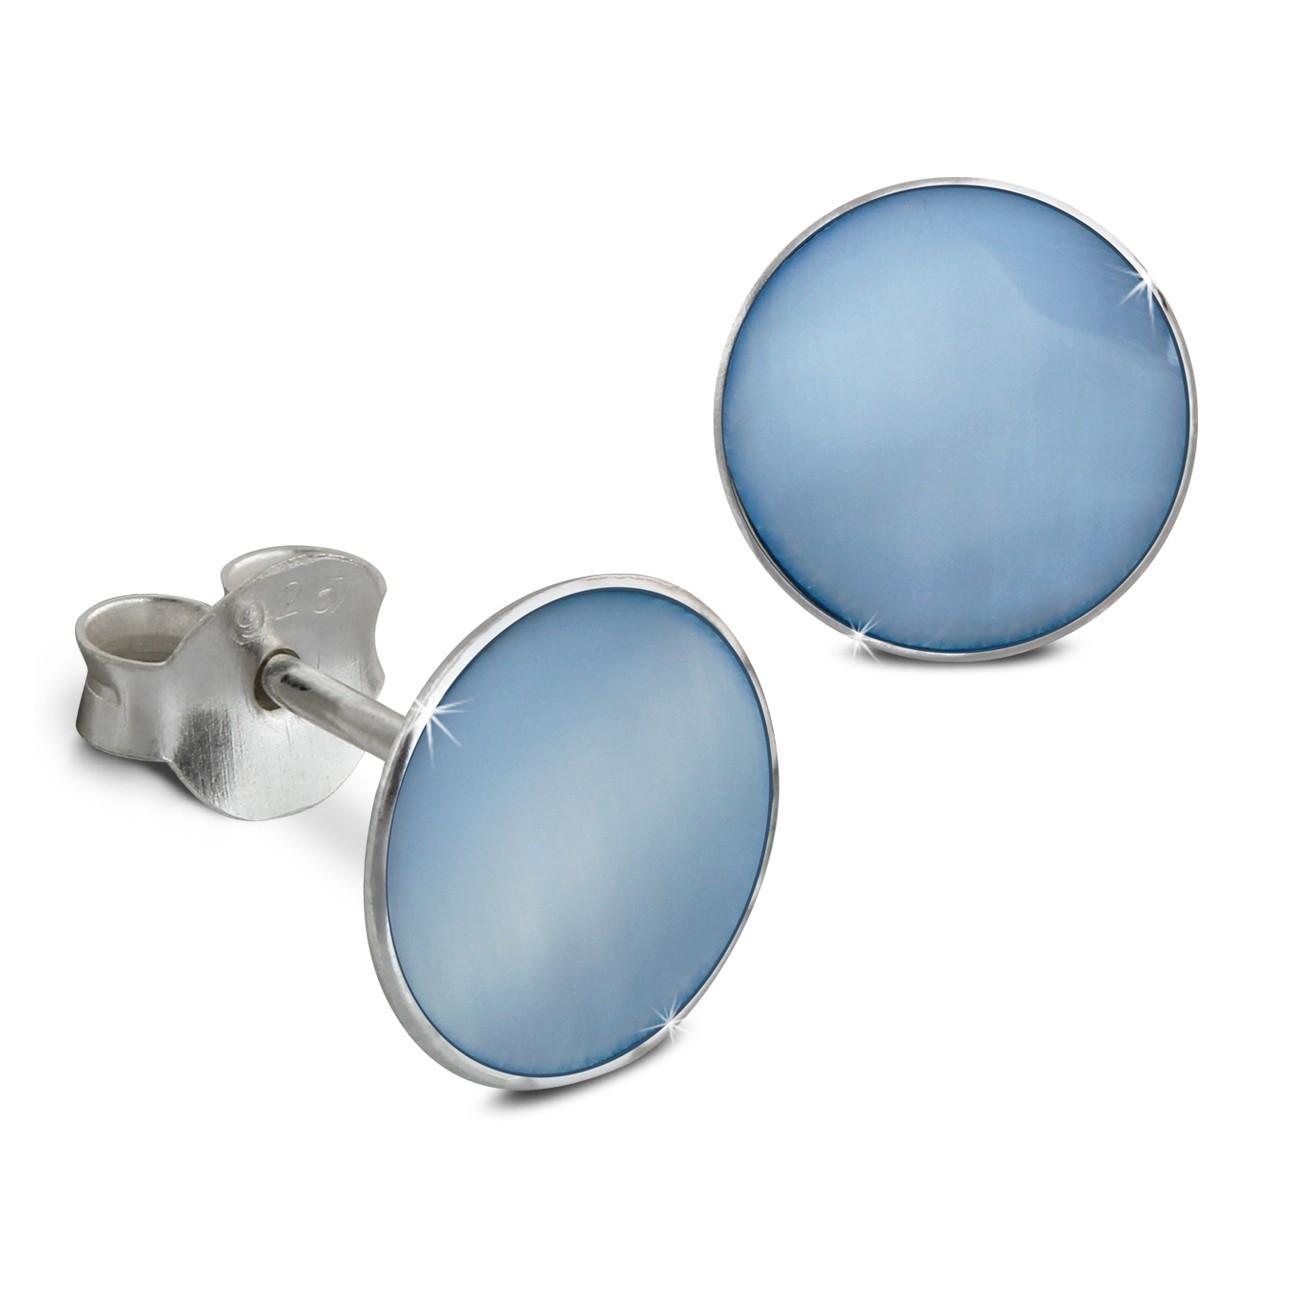 SilberDream Ohrstecker Shell hellblau 0,8cm 925 Silber SDO8500H